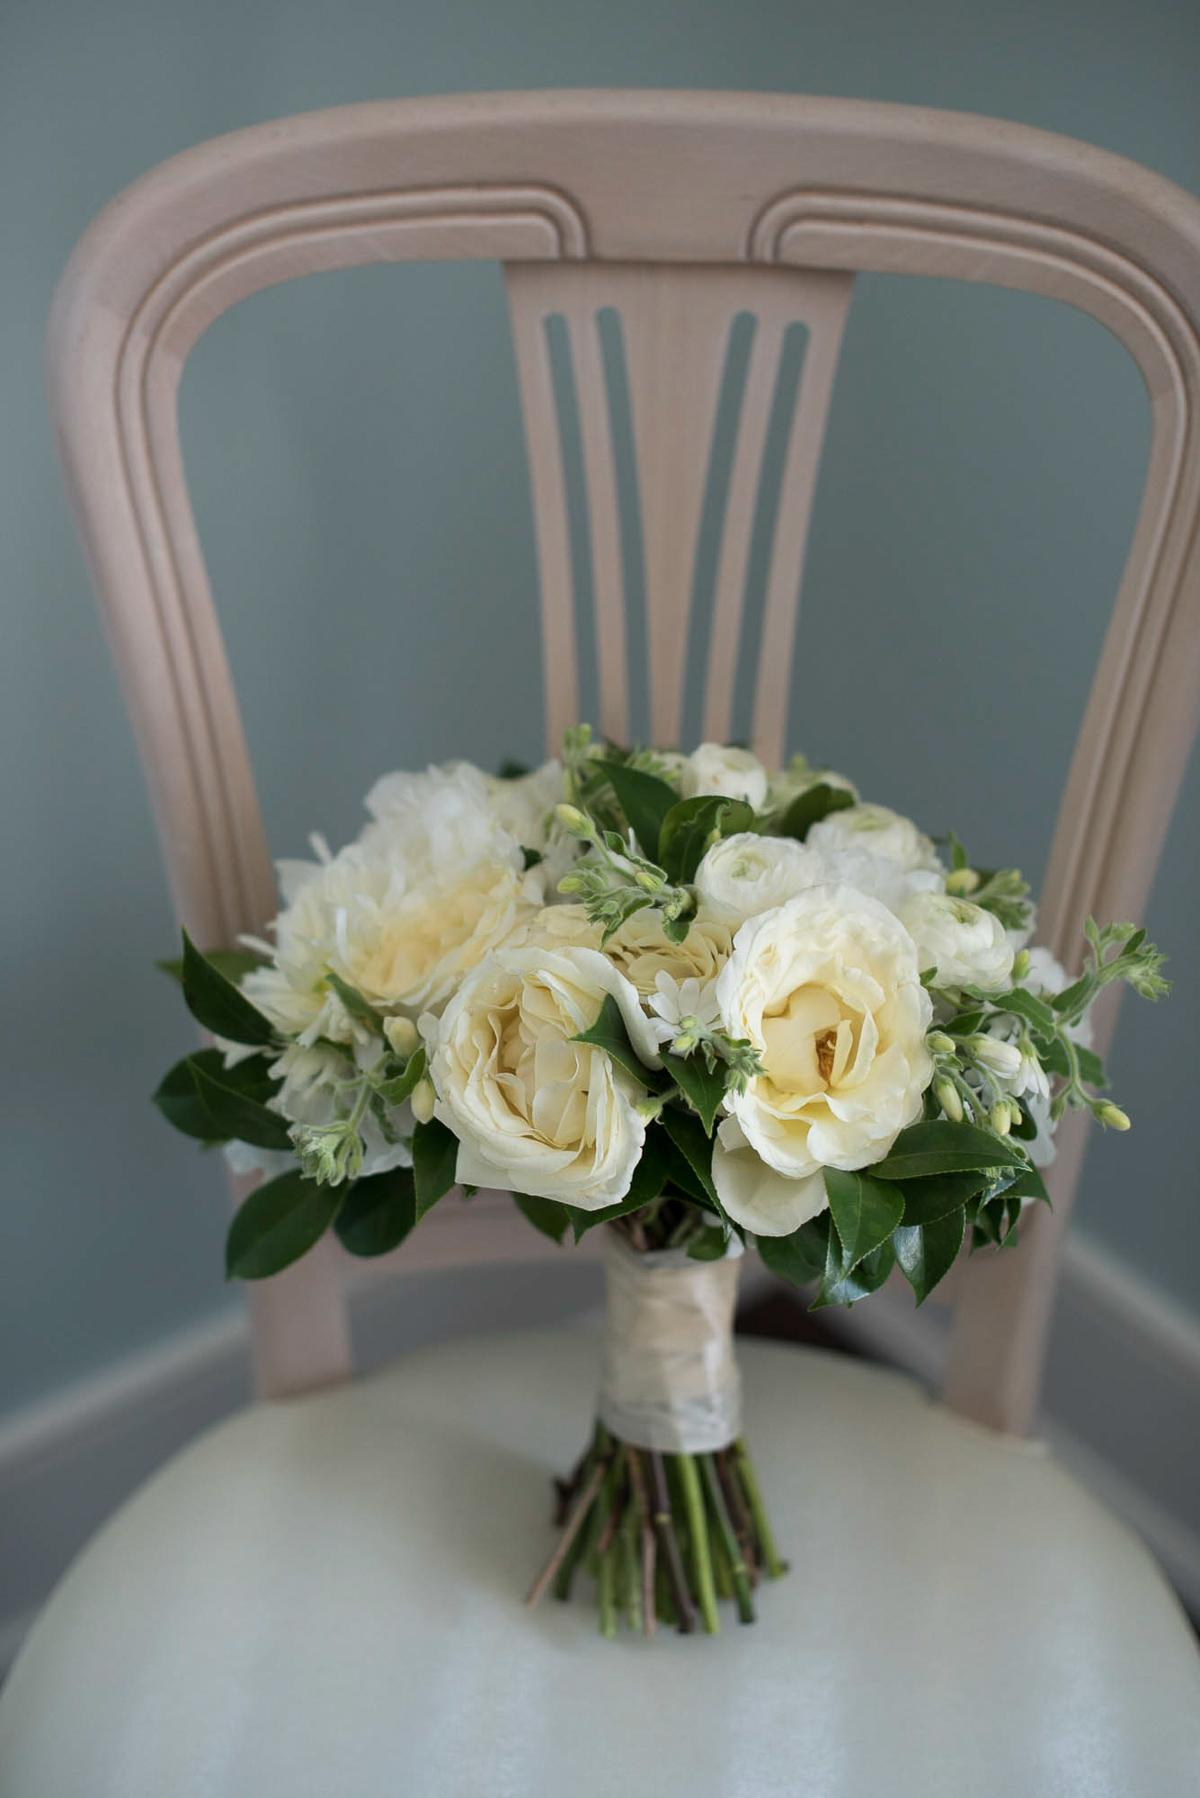 philosophy-studios-vineyard-bride-swish-list-chateau-des-charmes-niagara-on-the-lake-wedding-5.jpg